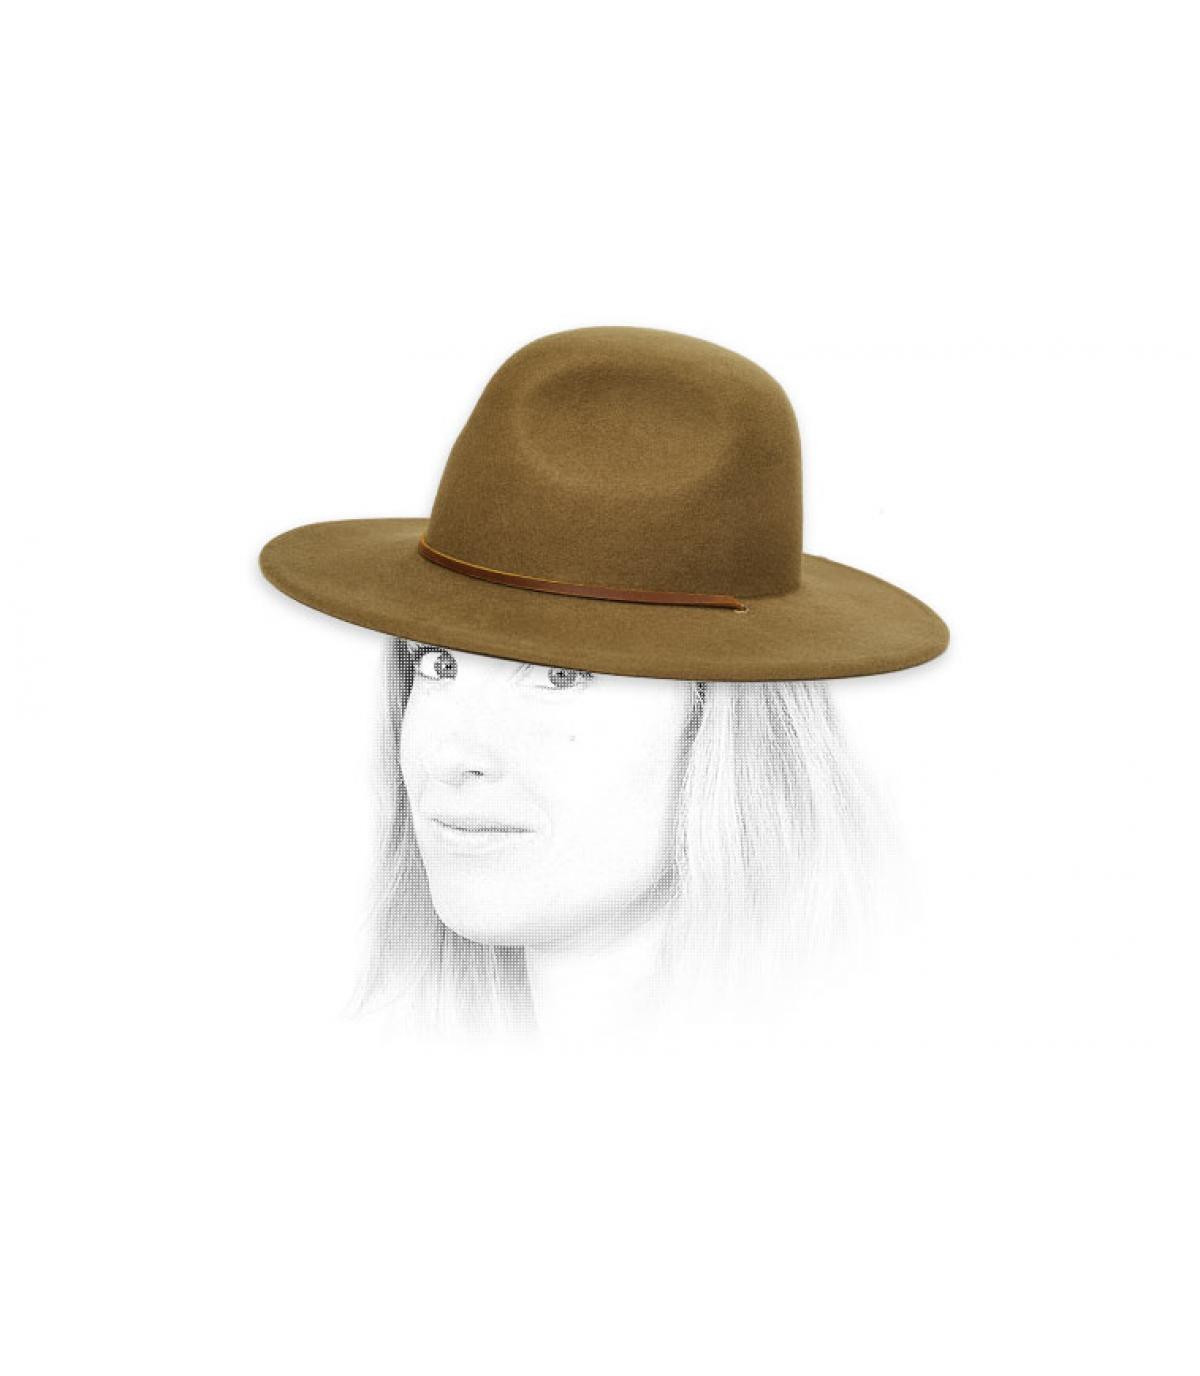 Damen Filz Hut olivgrün